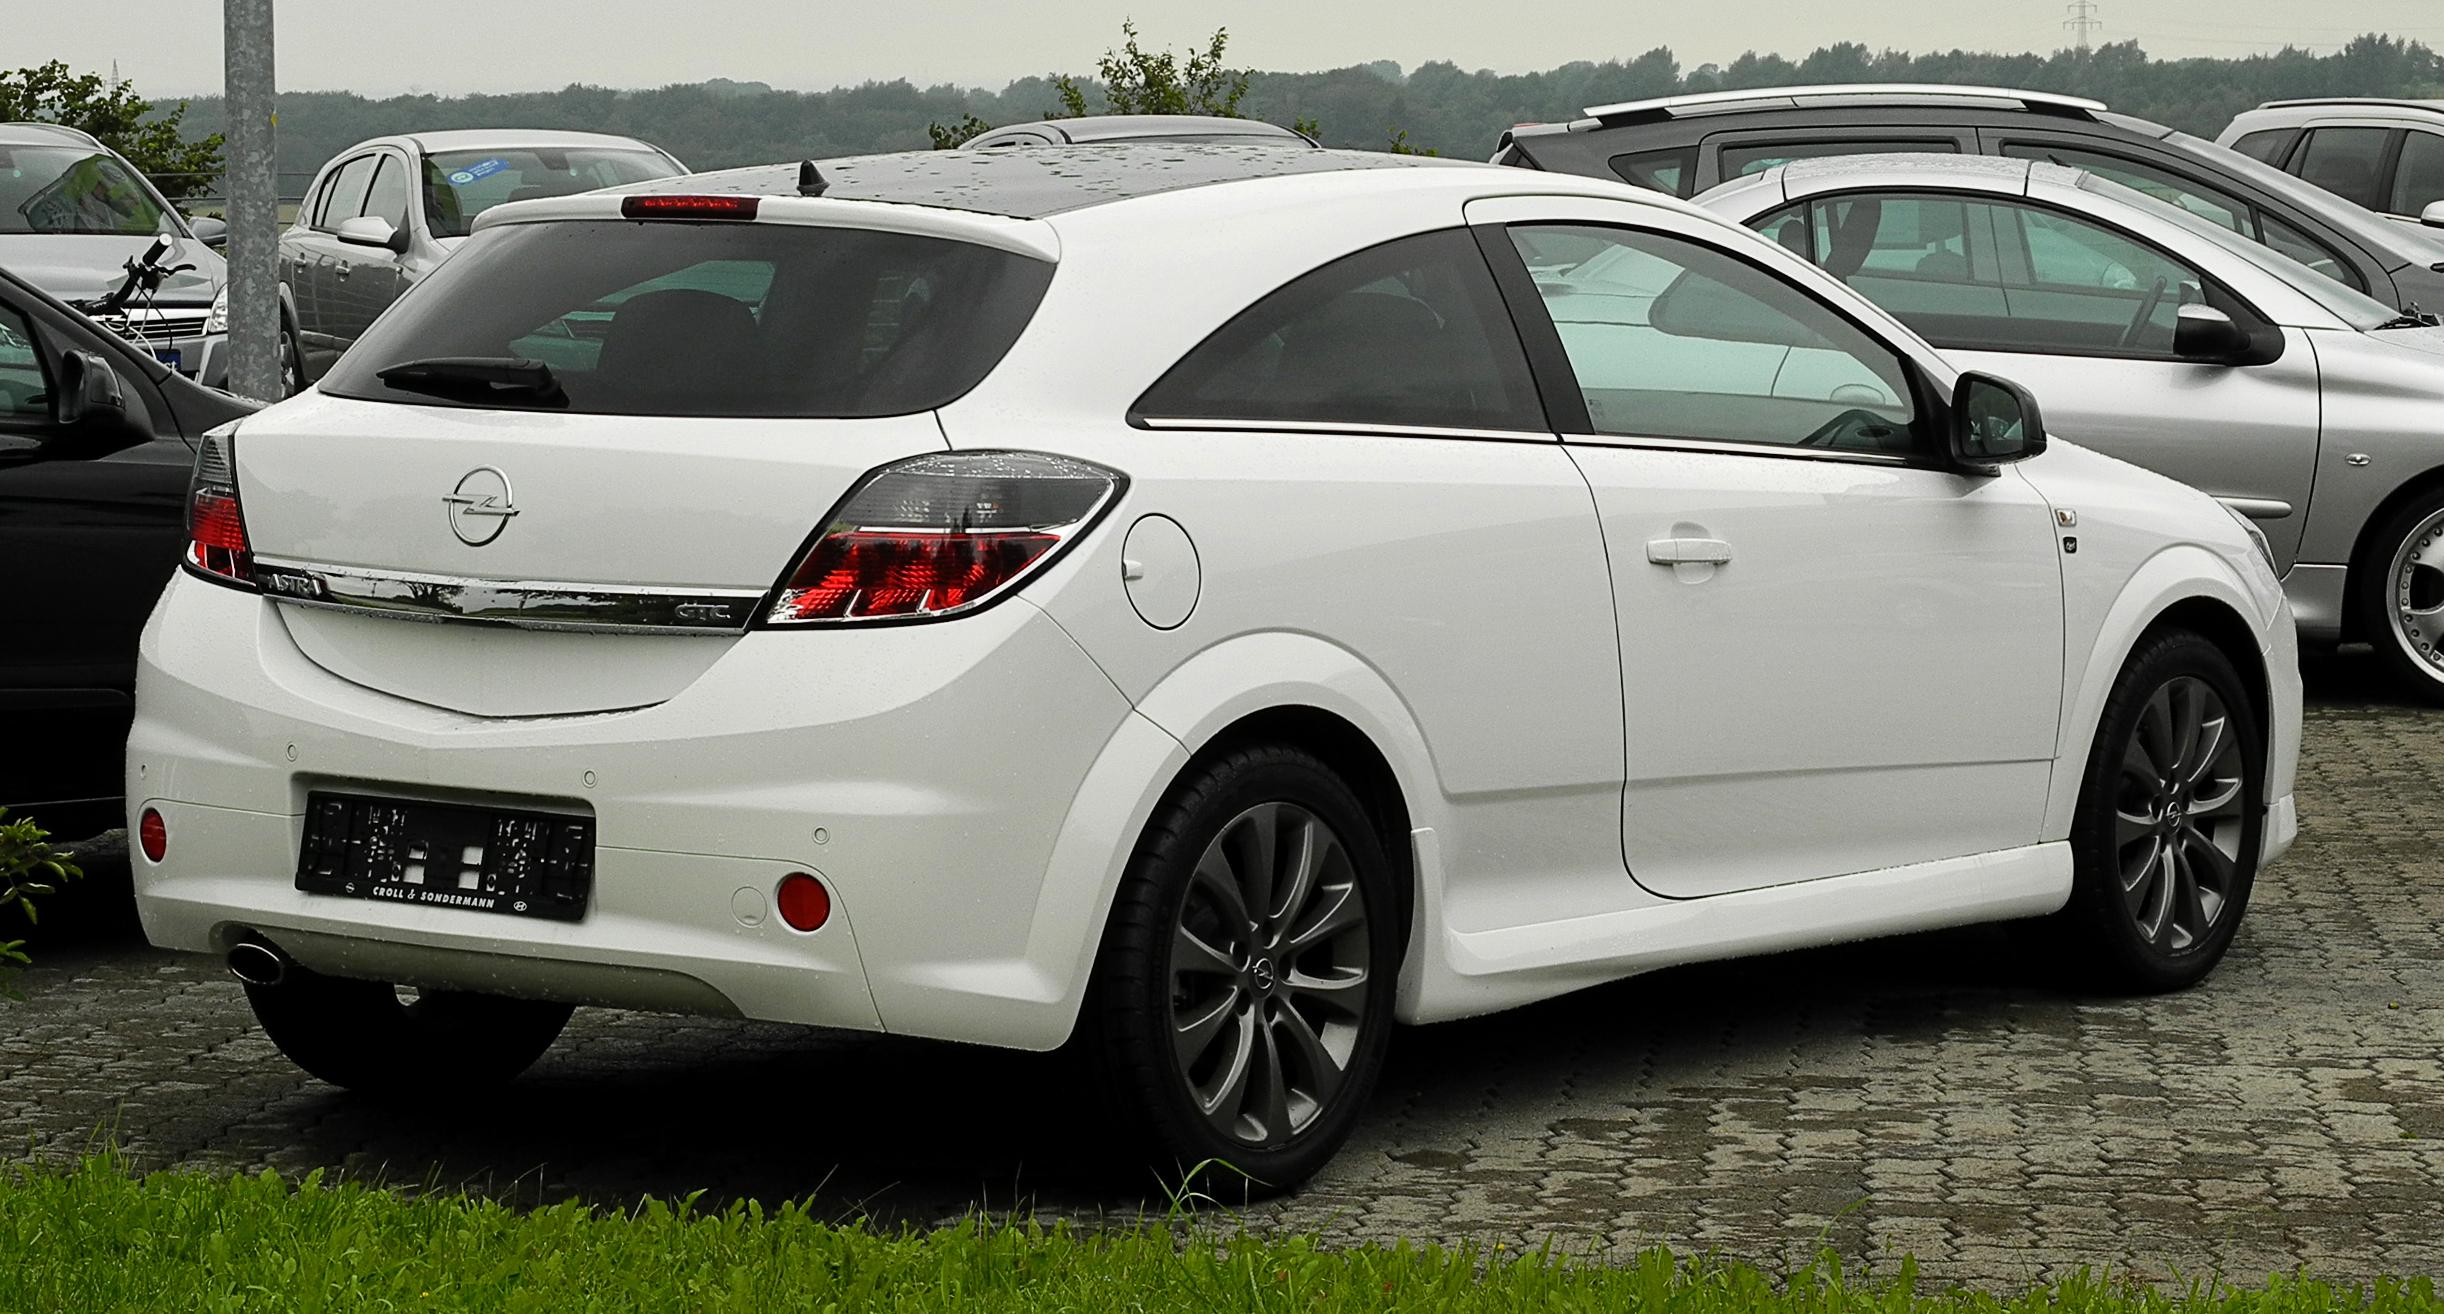 File:Opel Astra GTC 1.6 ECOTEC Black & White (H, Facelift ...